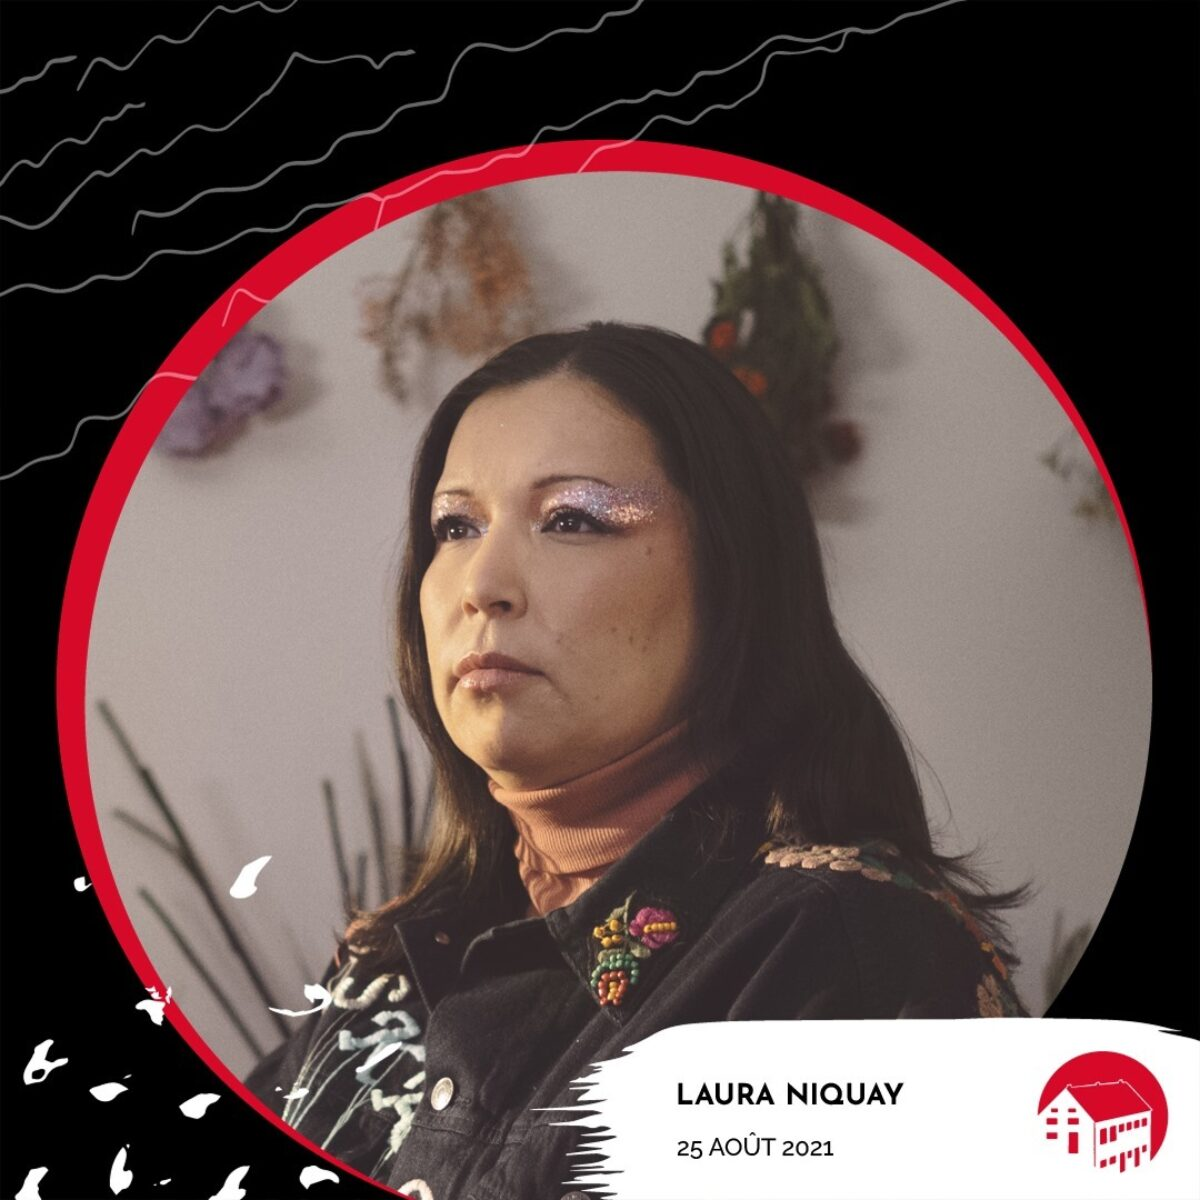 Laura Niquay